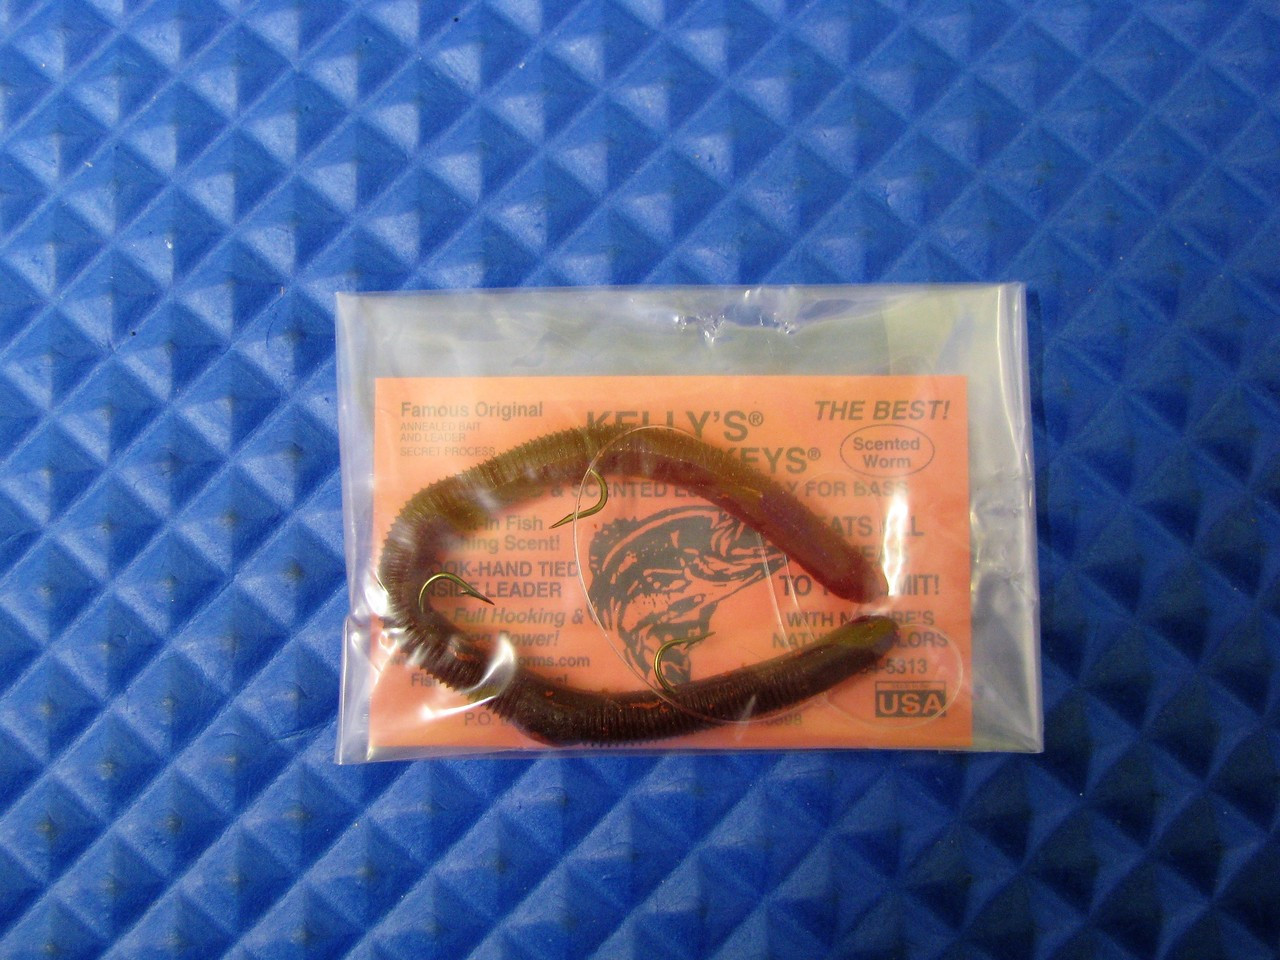 Kelly/'s Plow Jockey plastic worm *NEW* Orchid Petal*card of 12